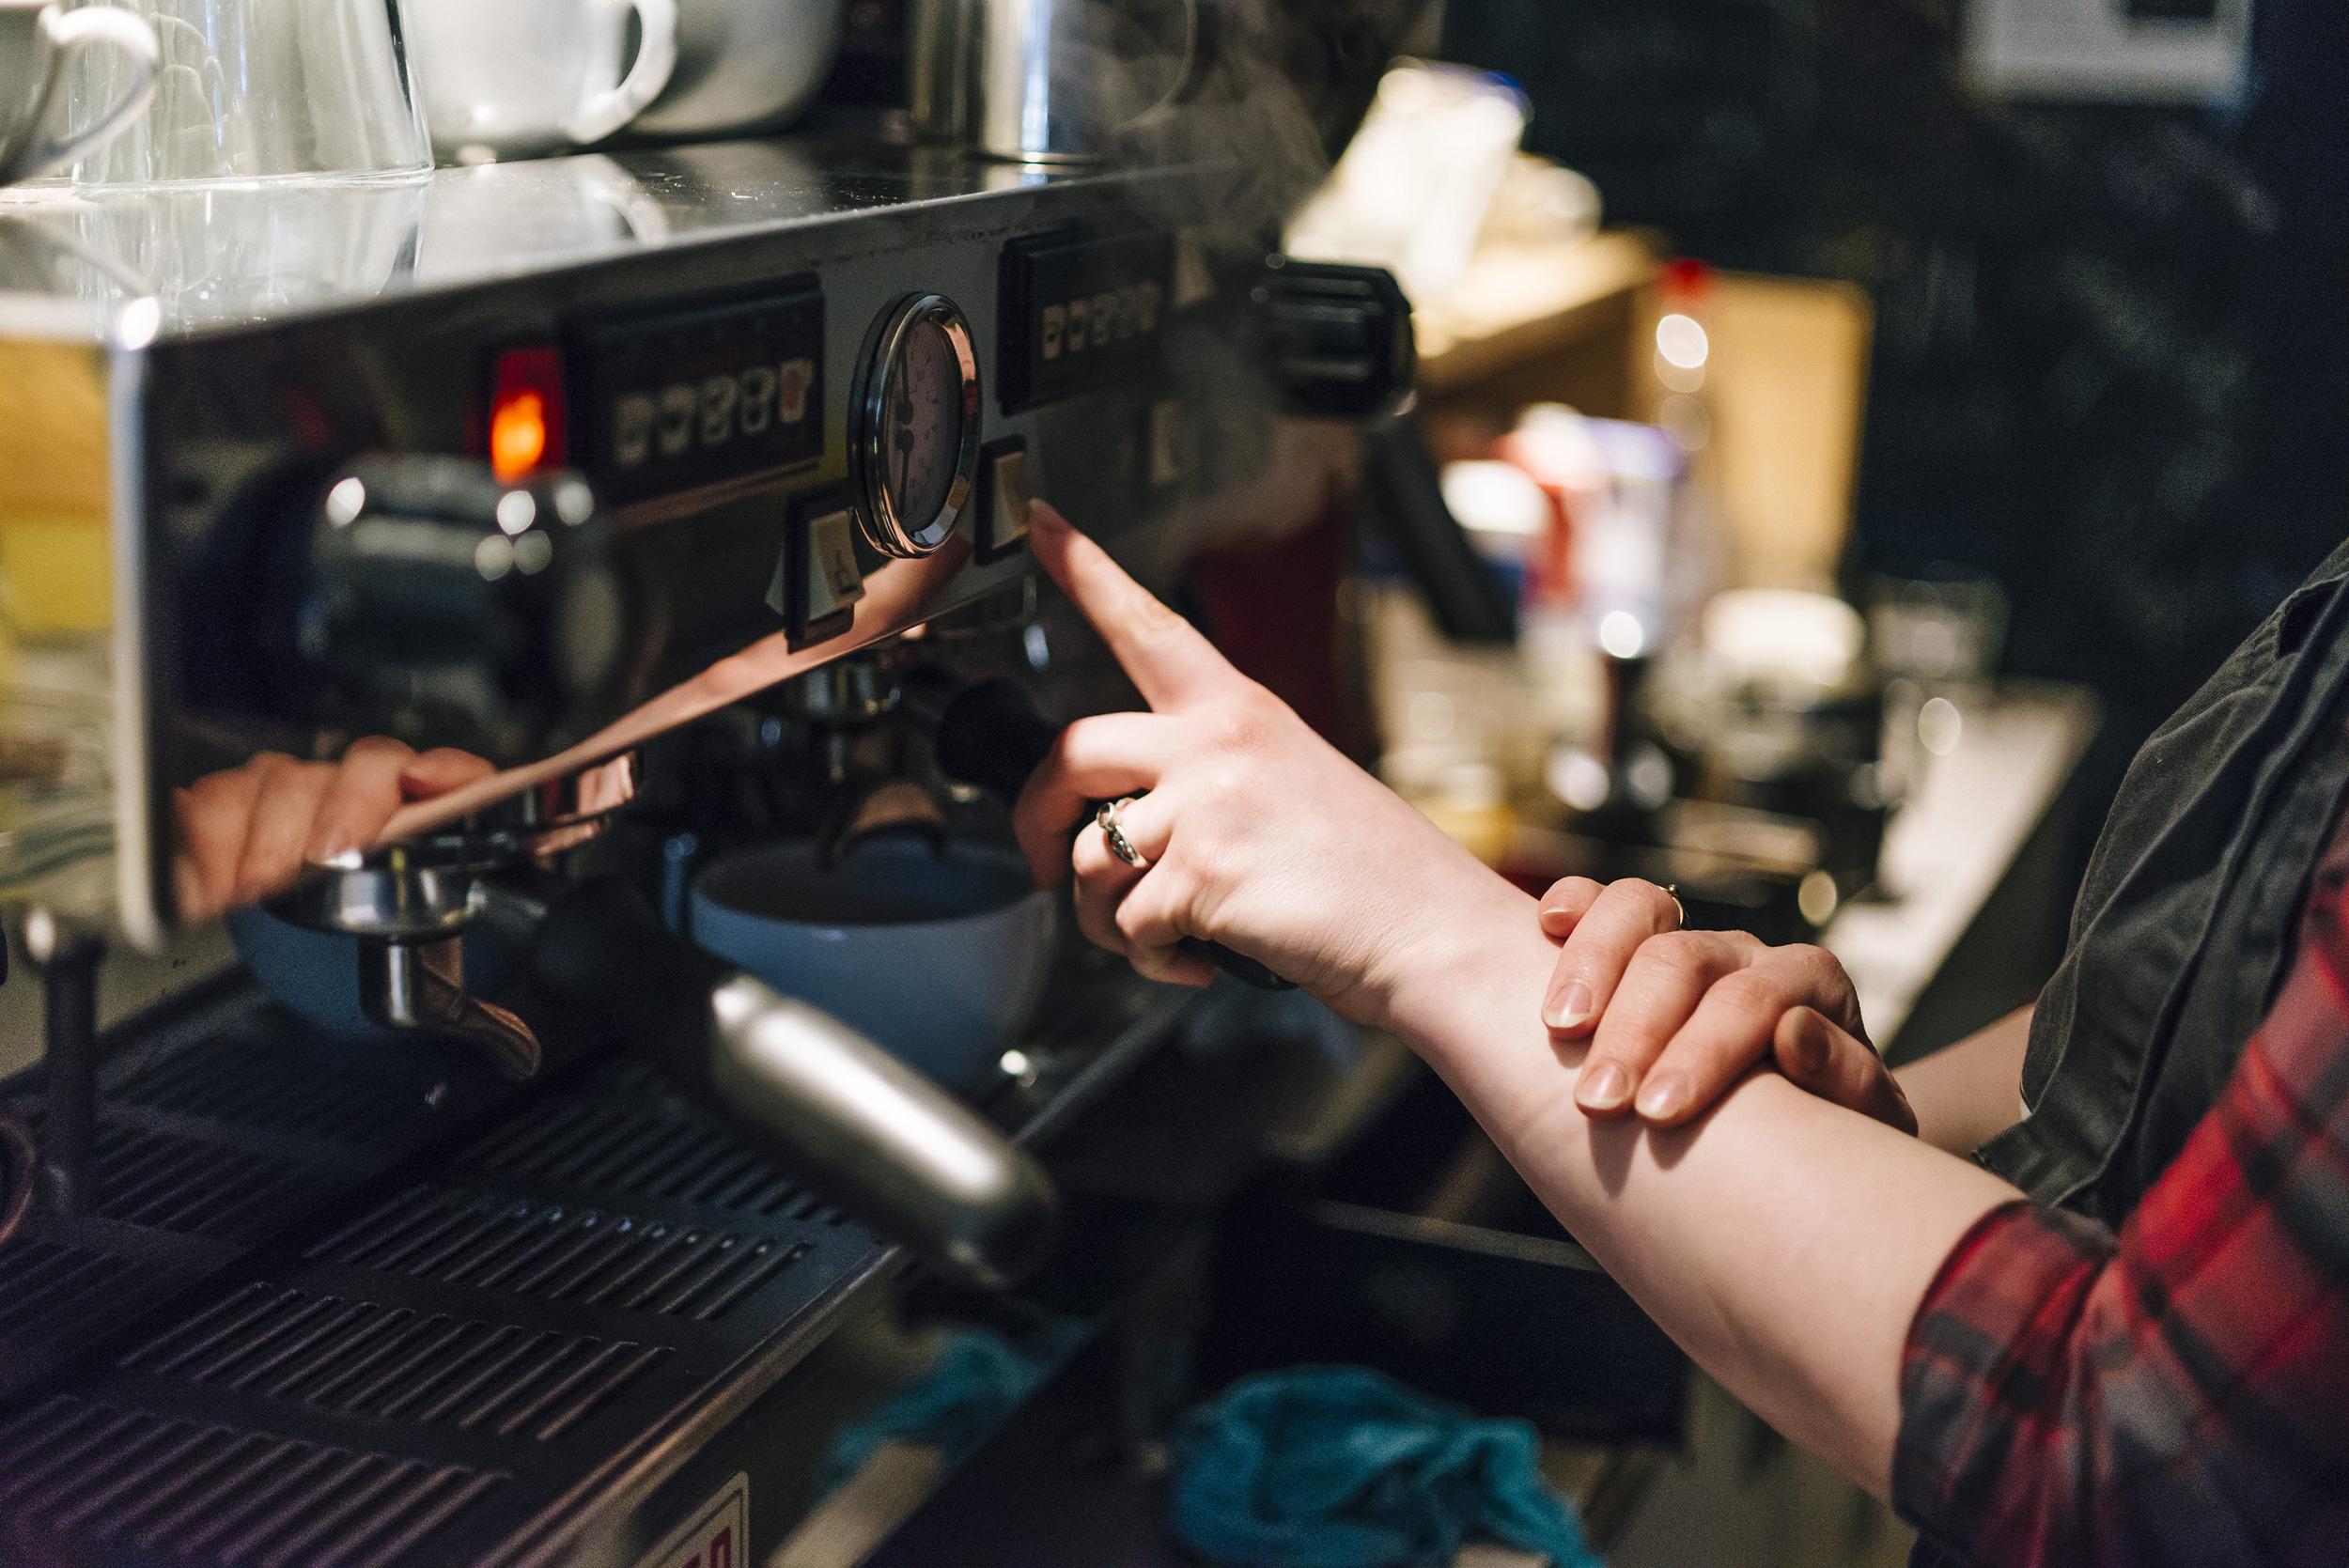 sweet-coffee-pirates-rüttenscheid-essen-pottspott-06.jpg